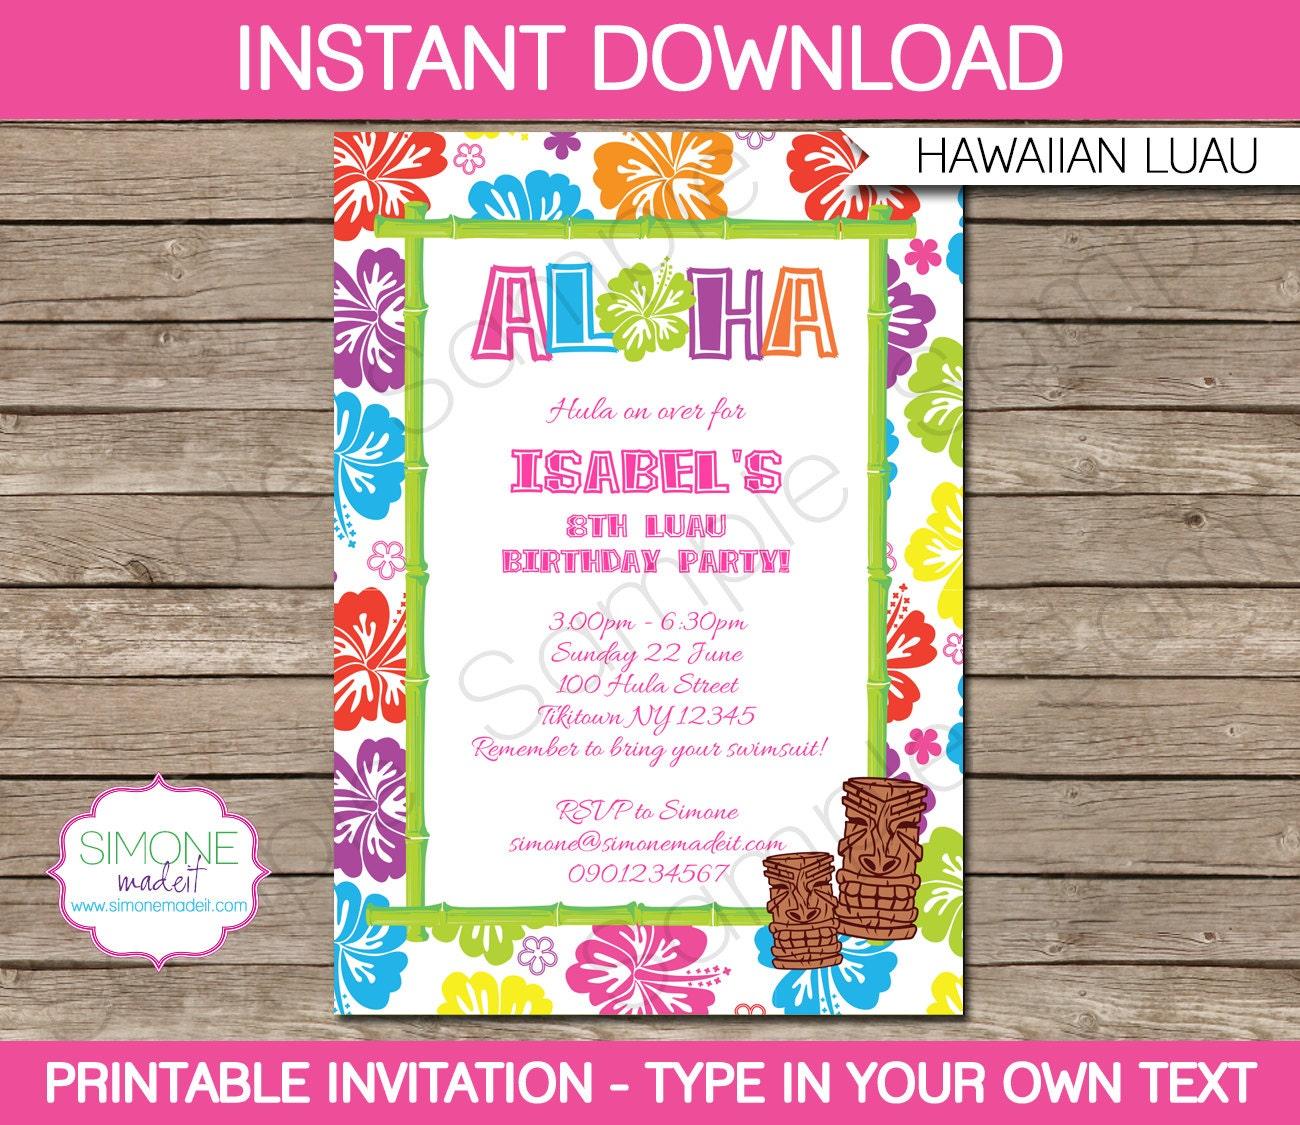 Luau invitation template birthday party instant download for Instant download invitations